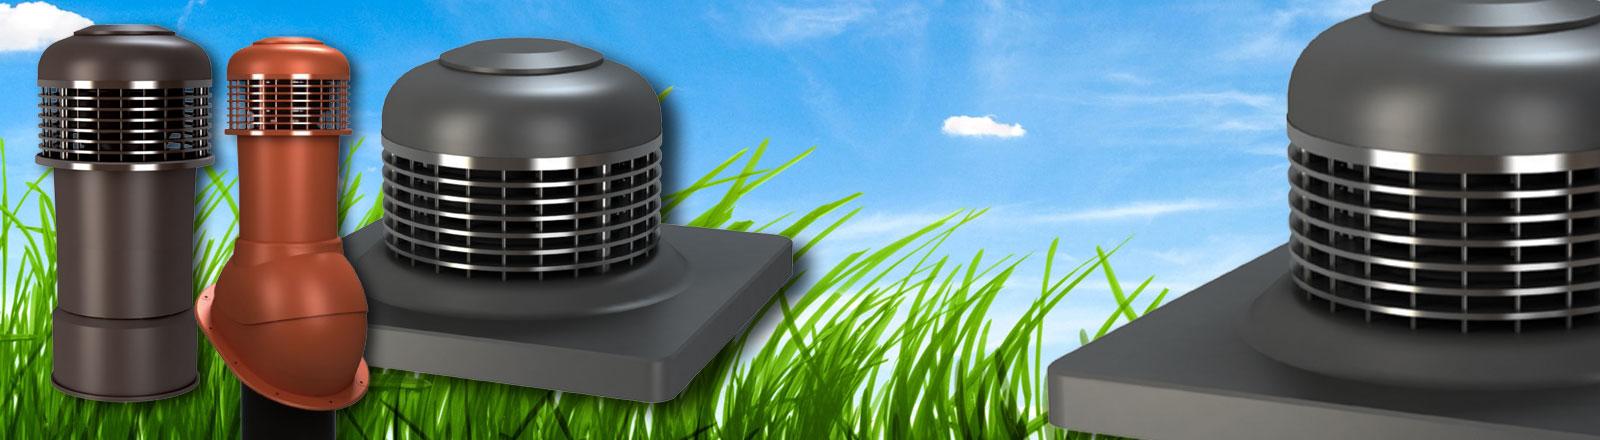 Wirplast a csendes tetőventilátor